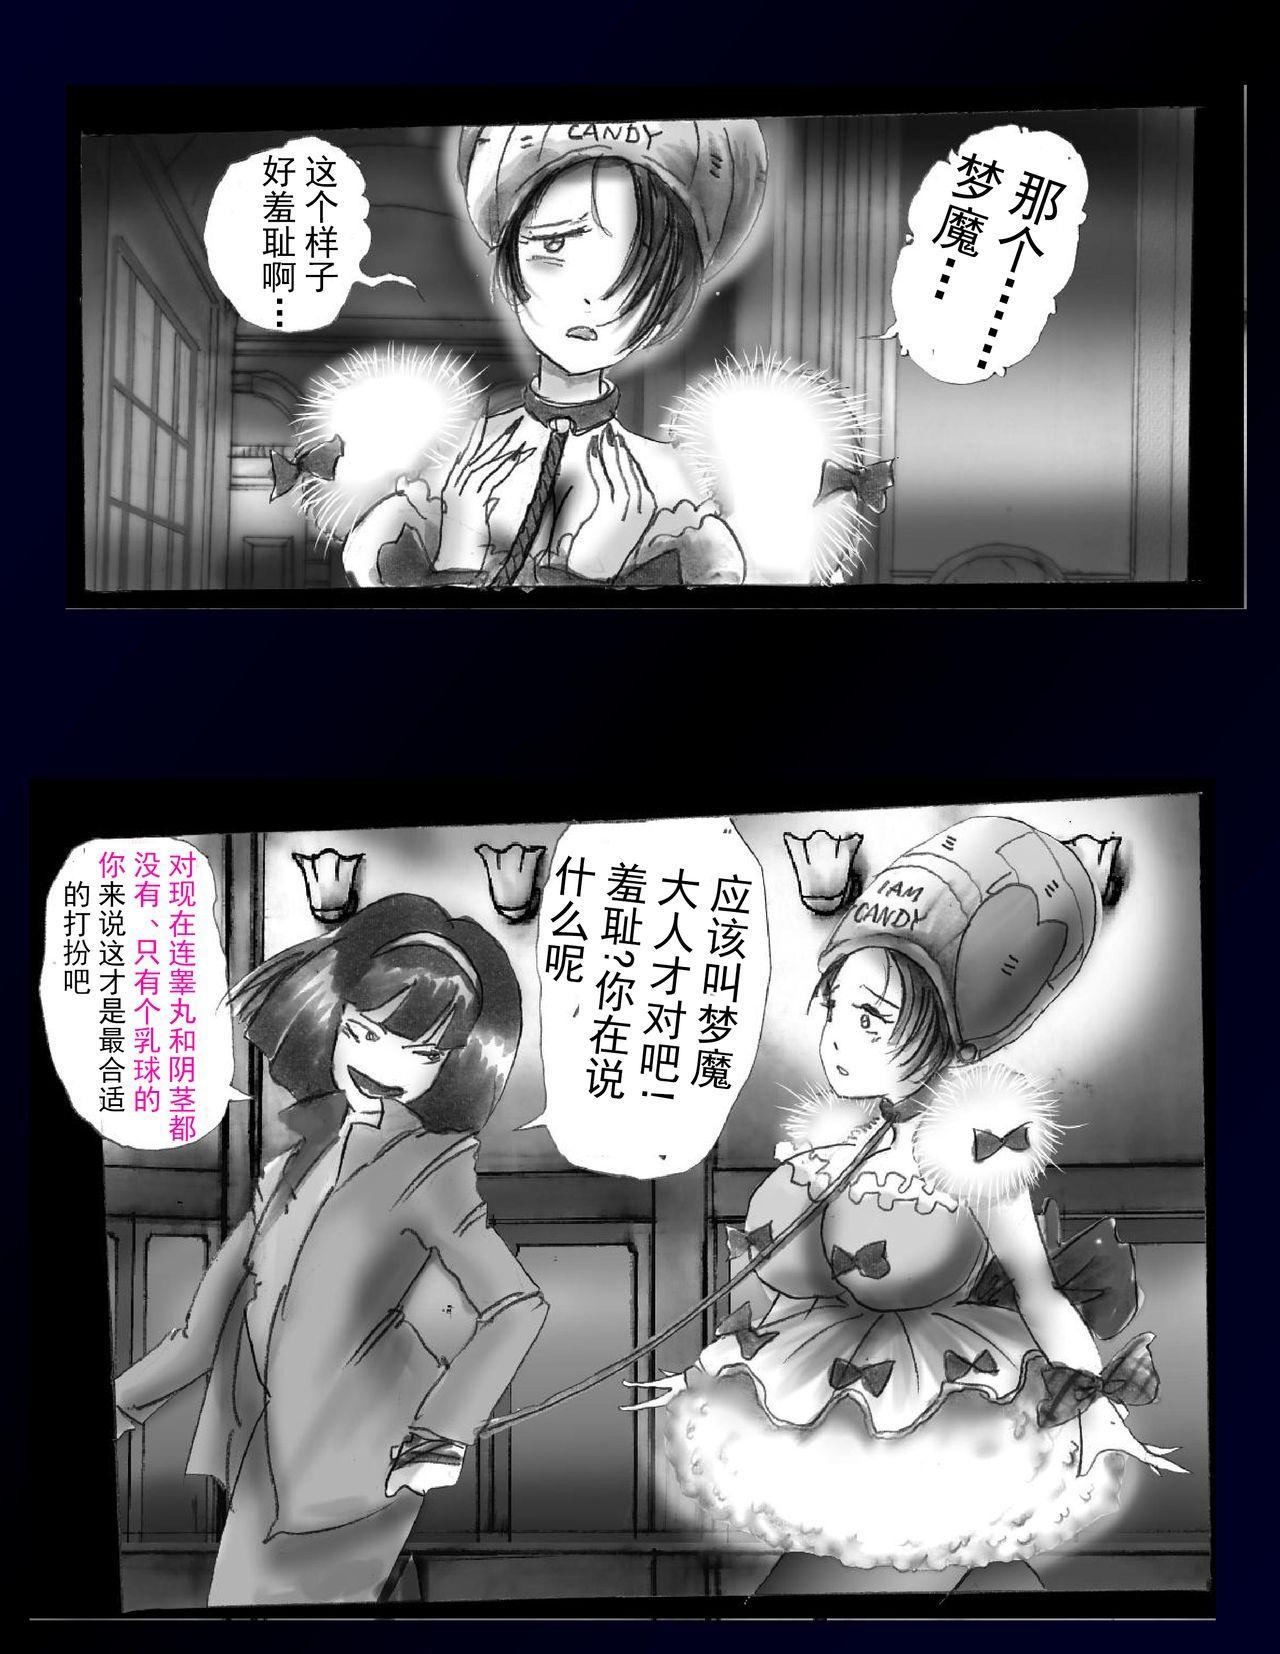 Kyousei Nyotaika Dress 51